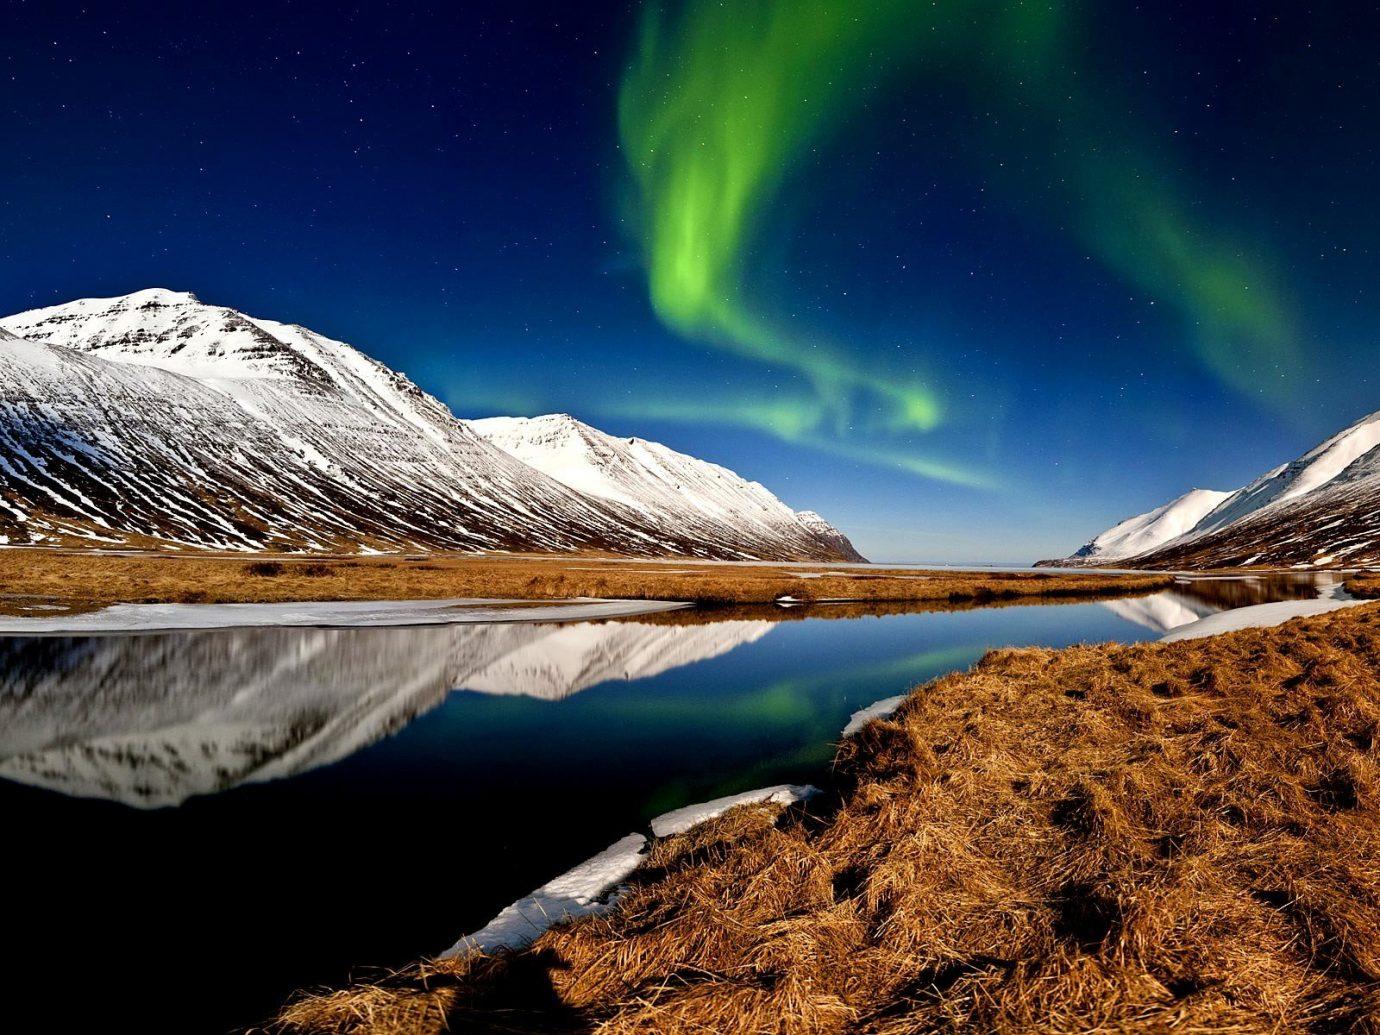 Hotels Iceland Travel Tips Trip Ideas outdoor Nature mountain geological phenomenon aurora landscape mountain range